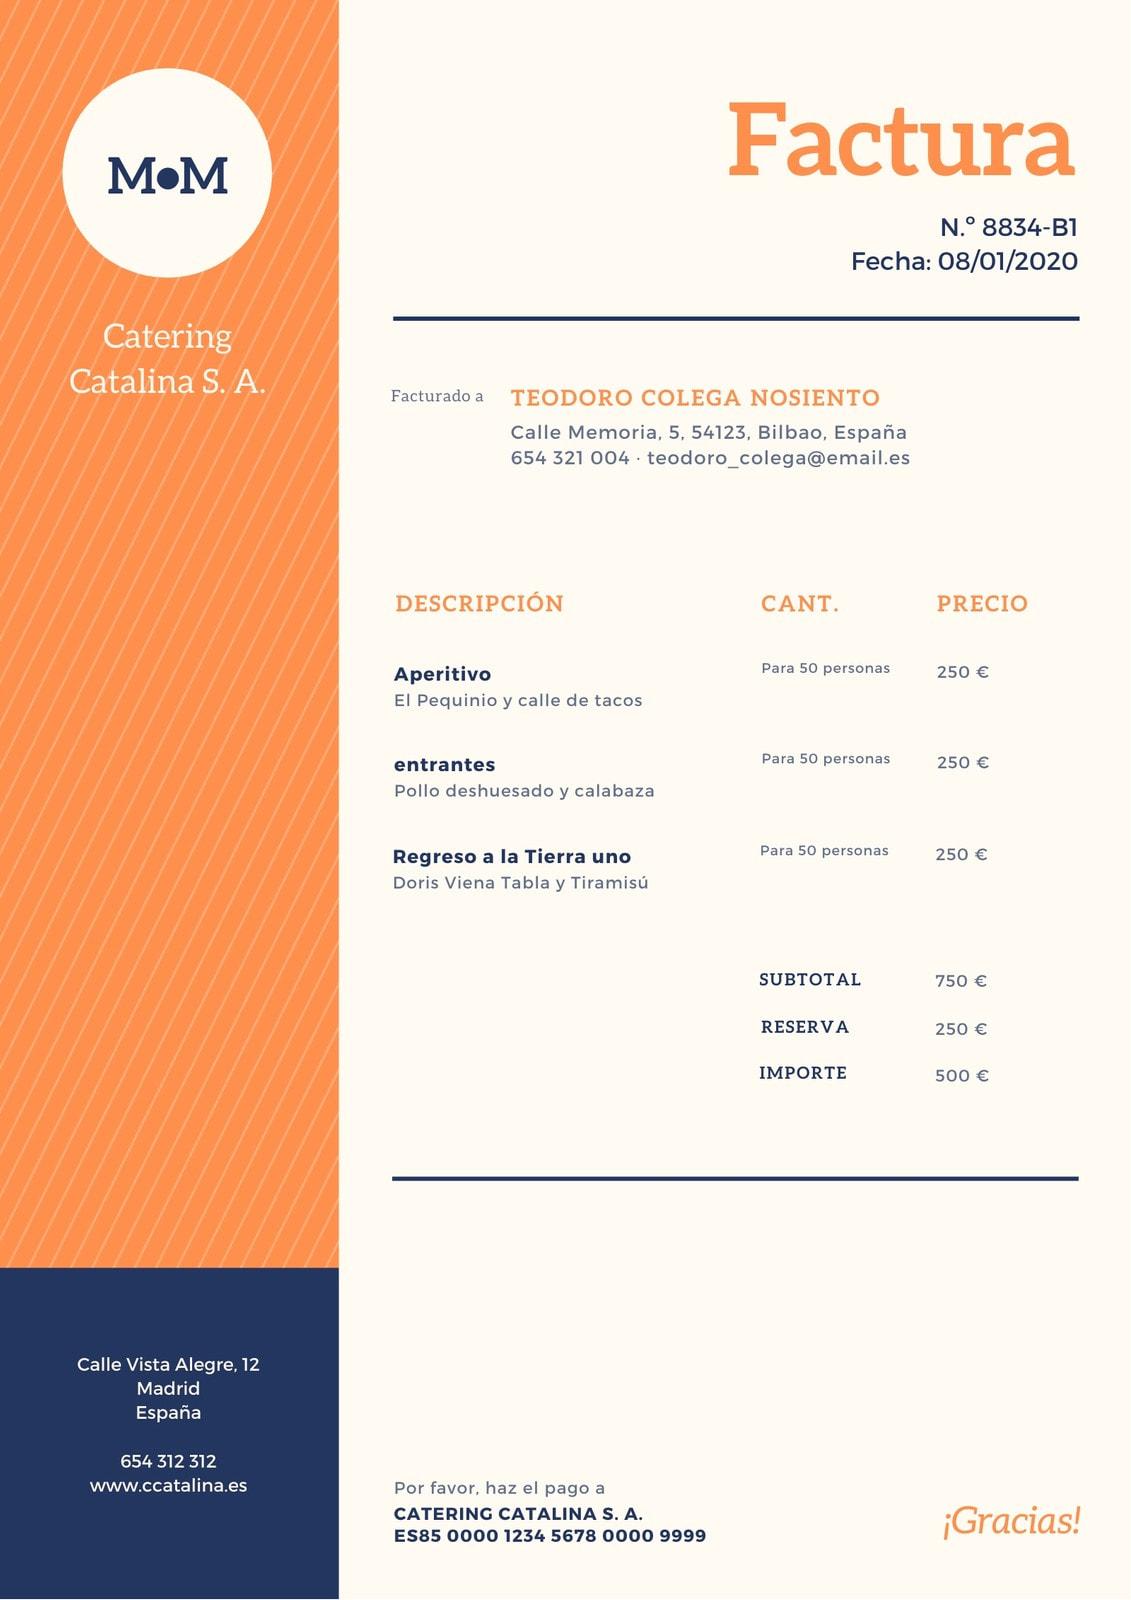 Naranja Azul Estampado Negocio Factura